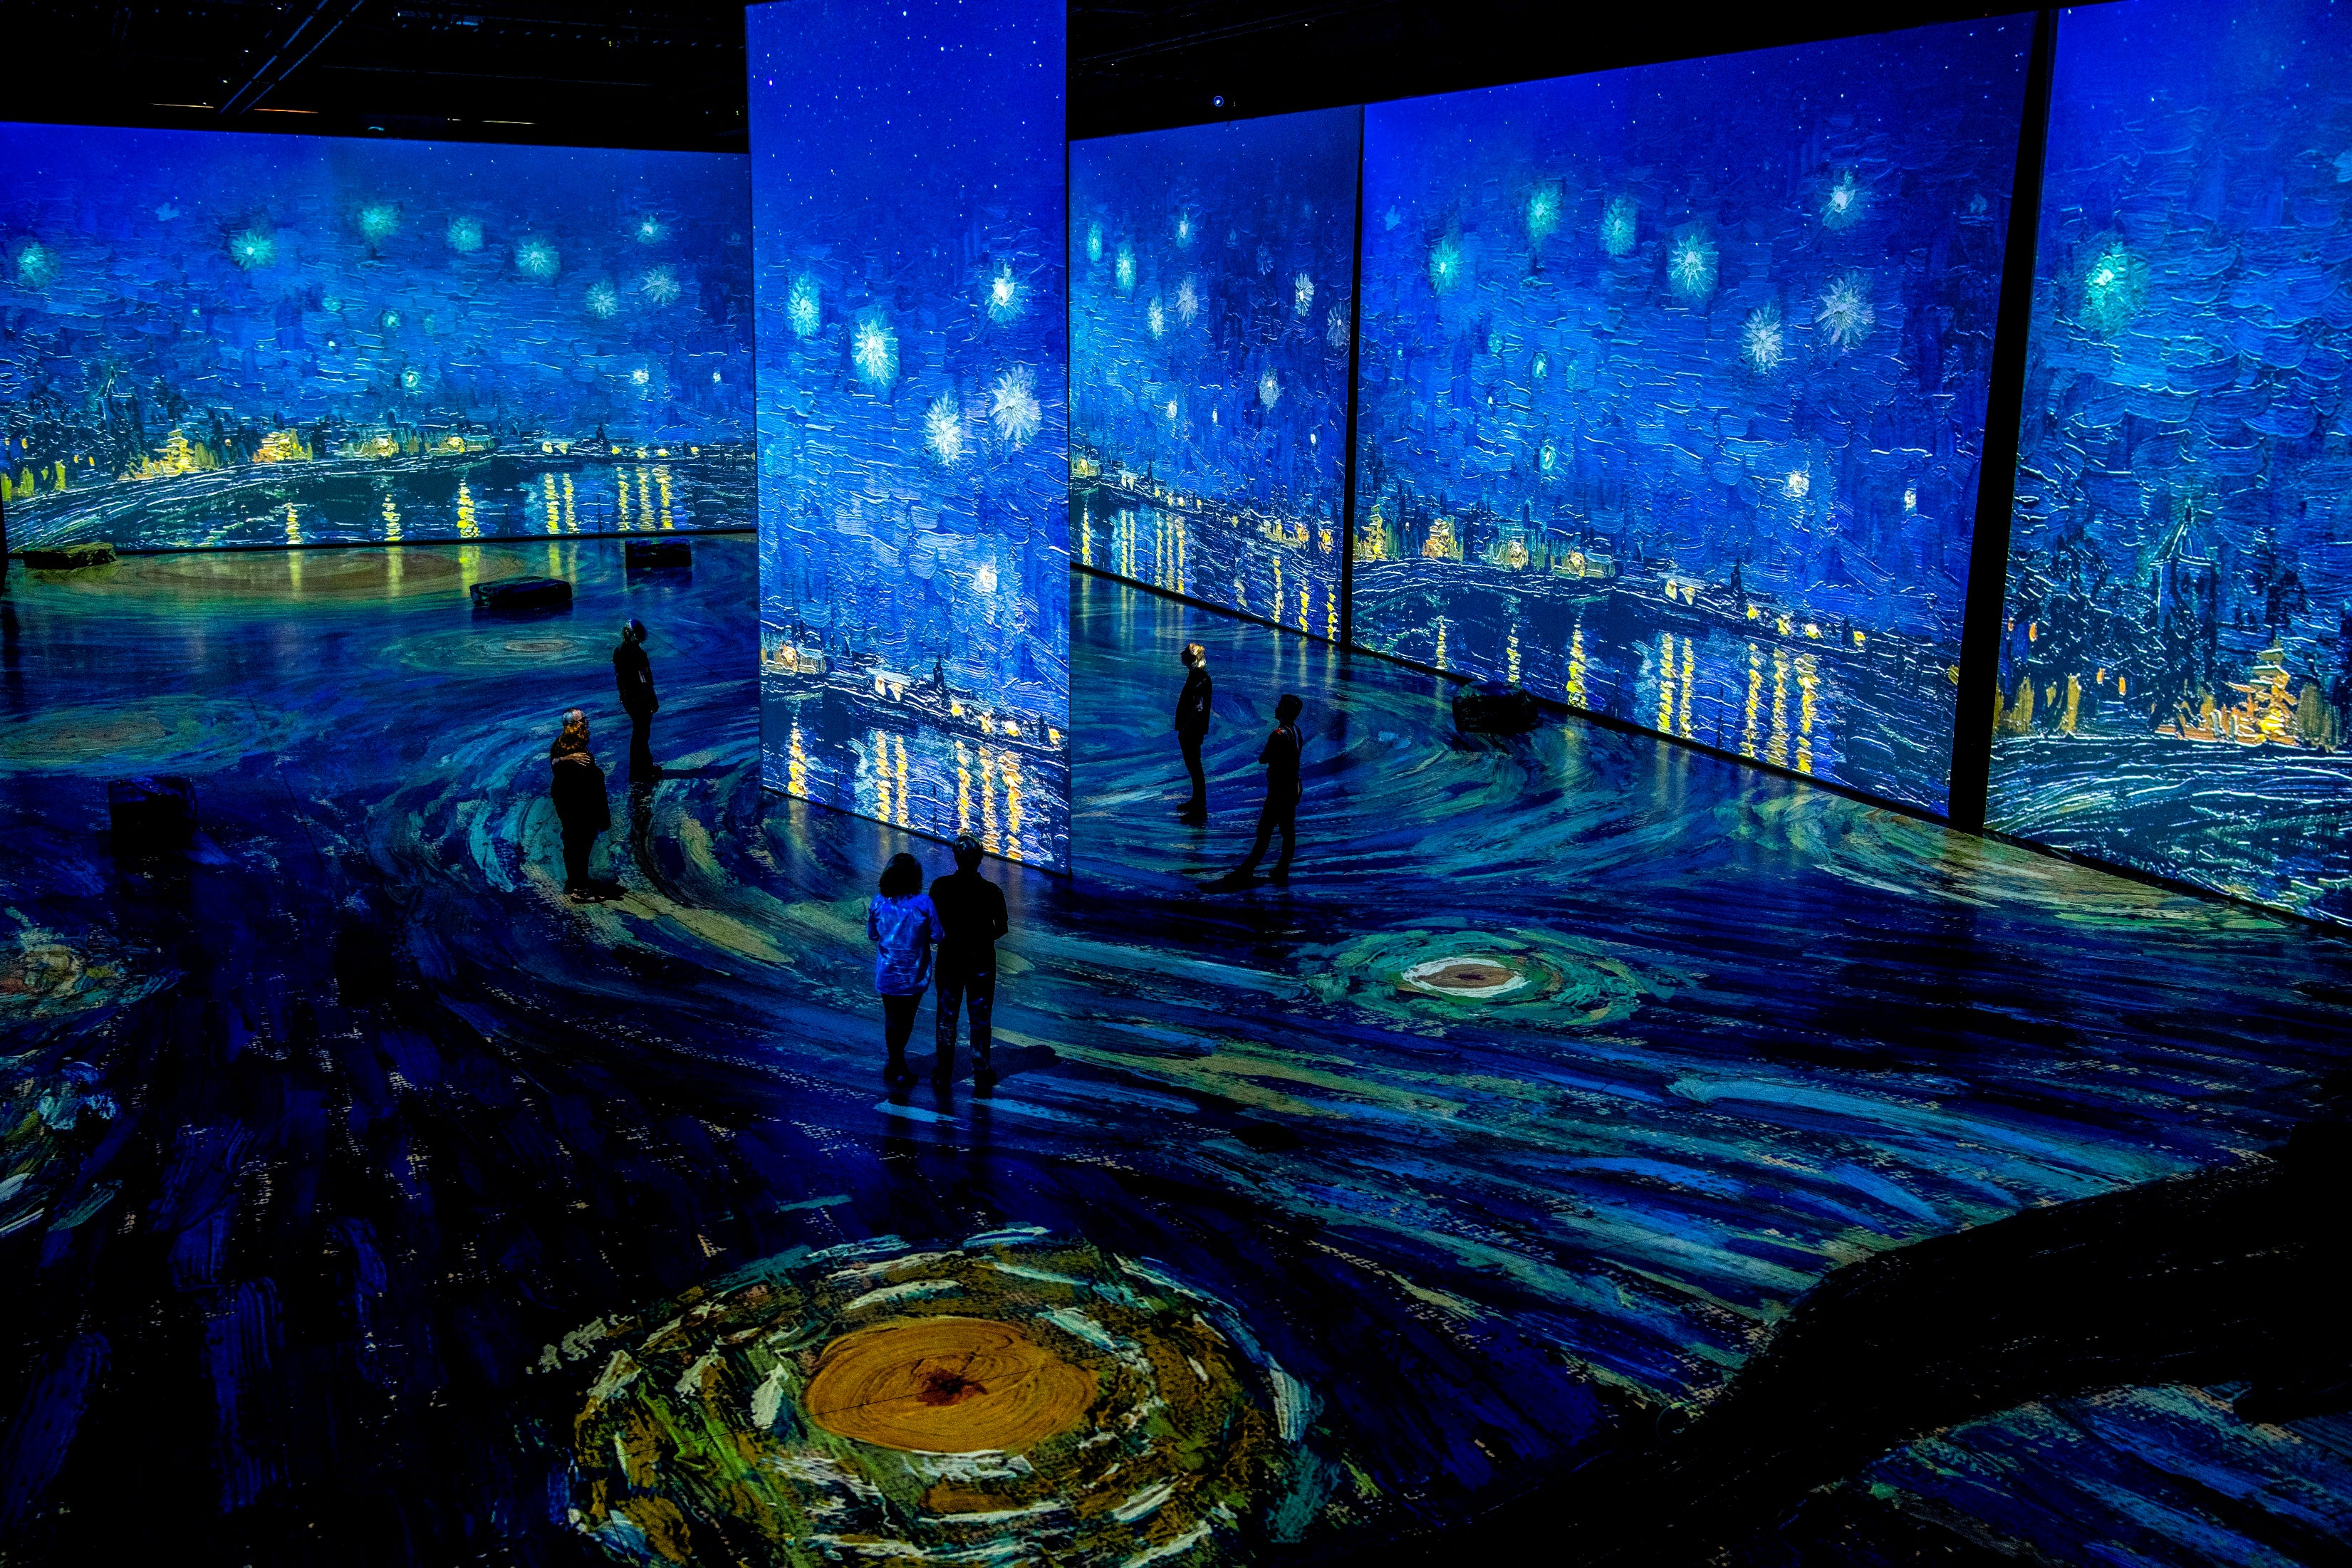 Imagine van Gogh' immersive exhibition coming to Boston